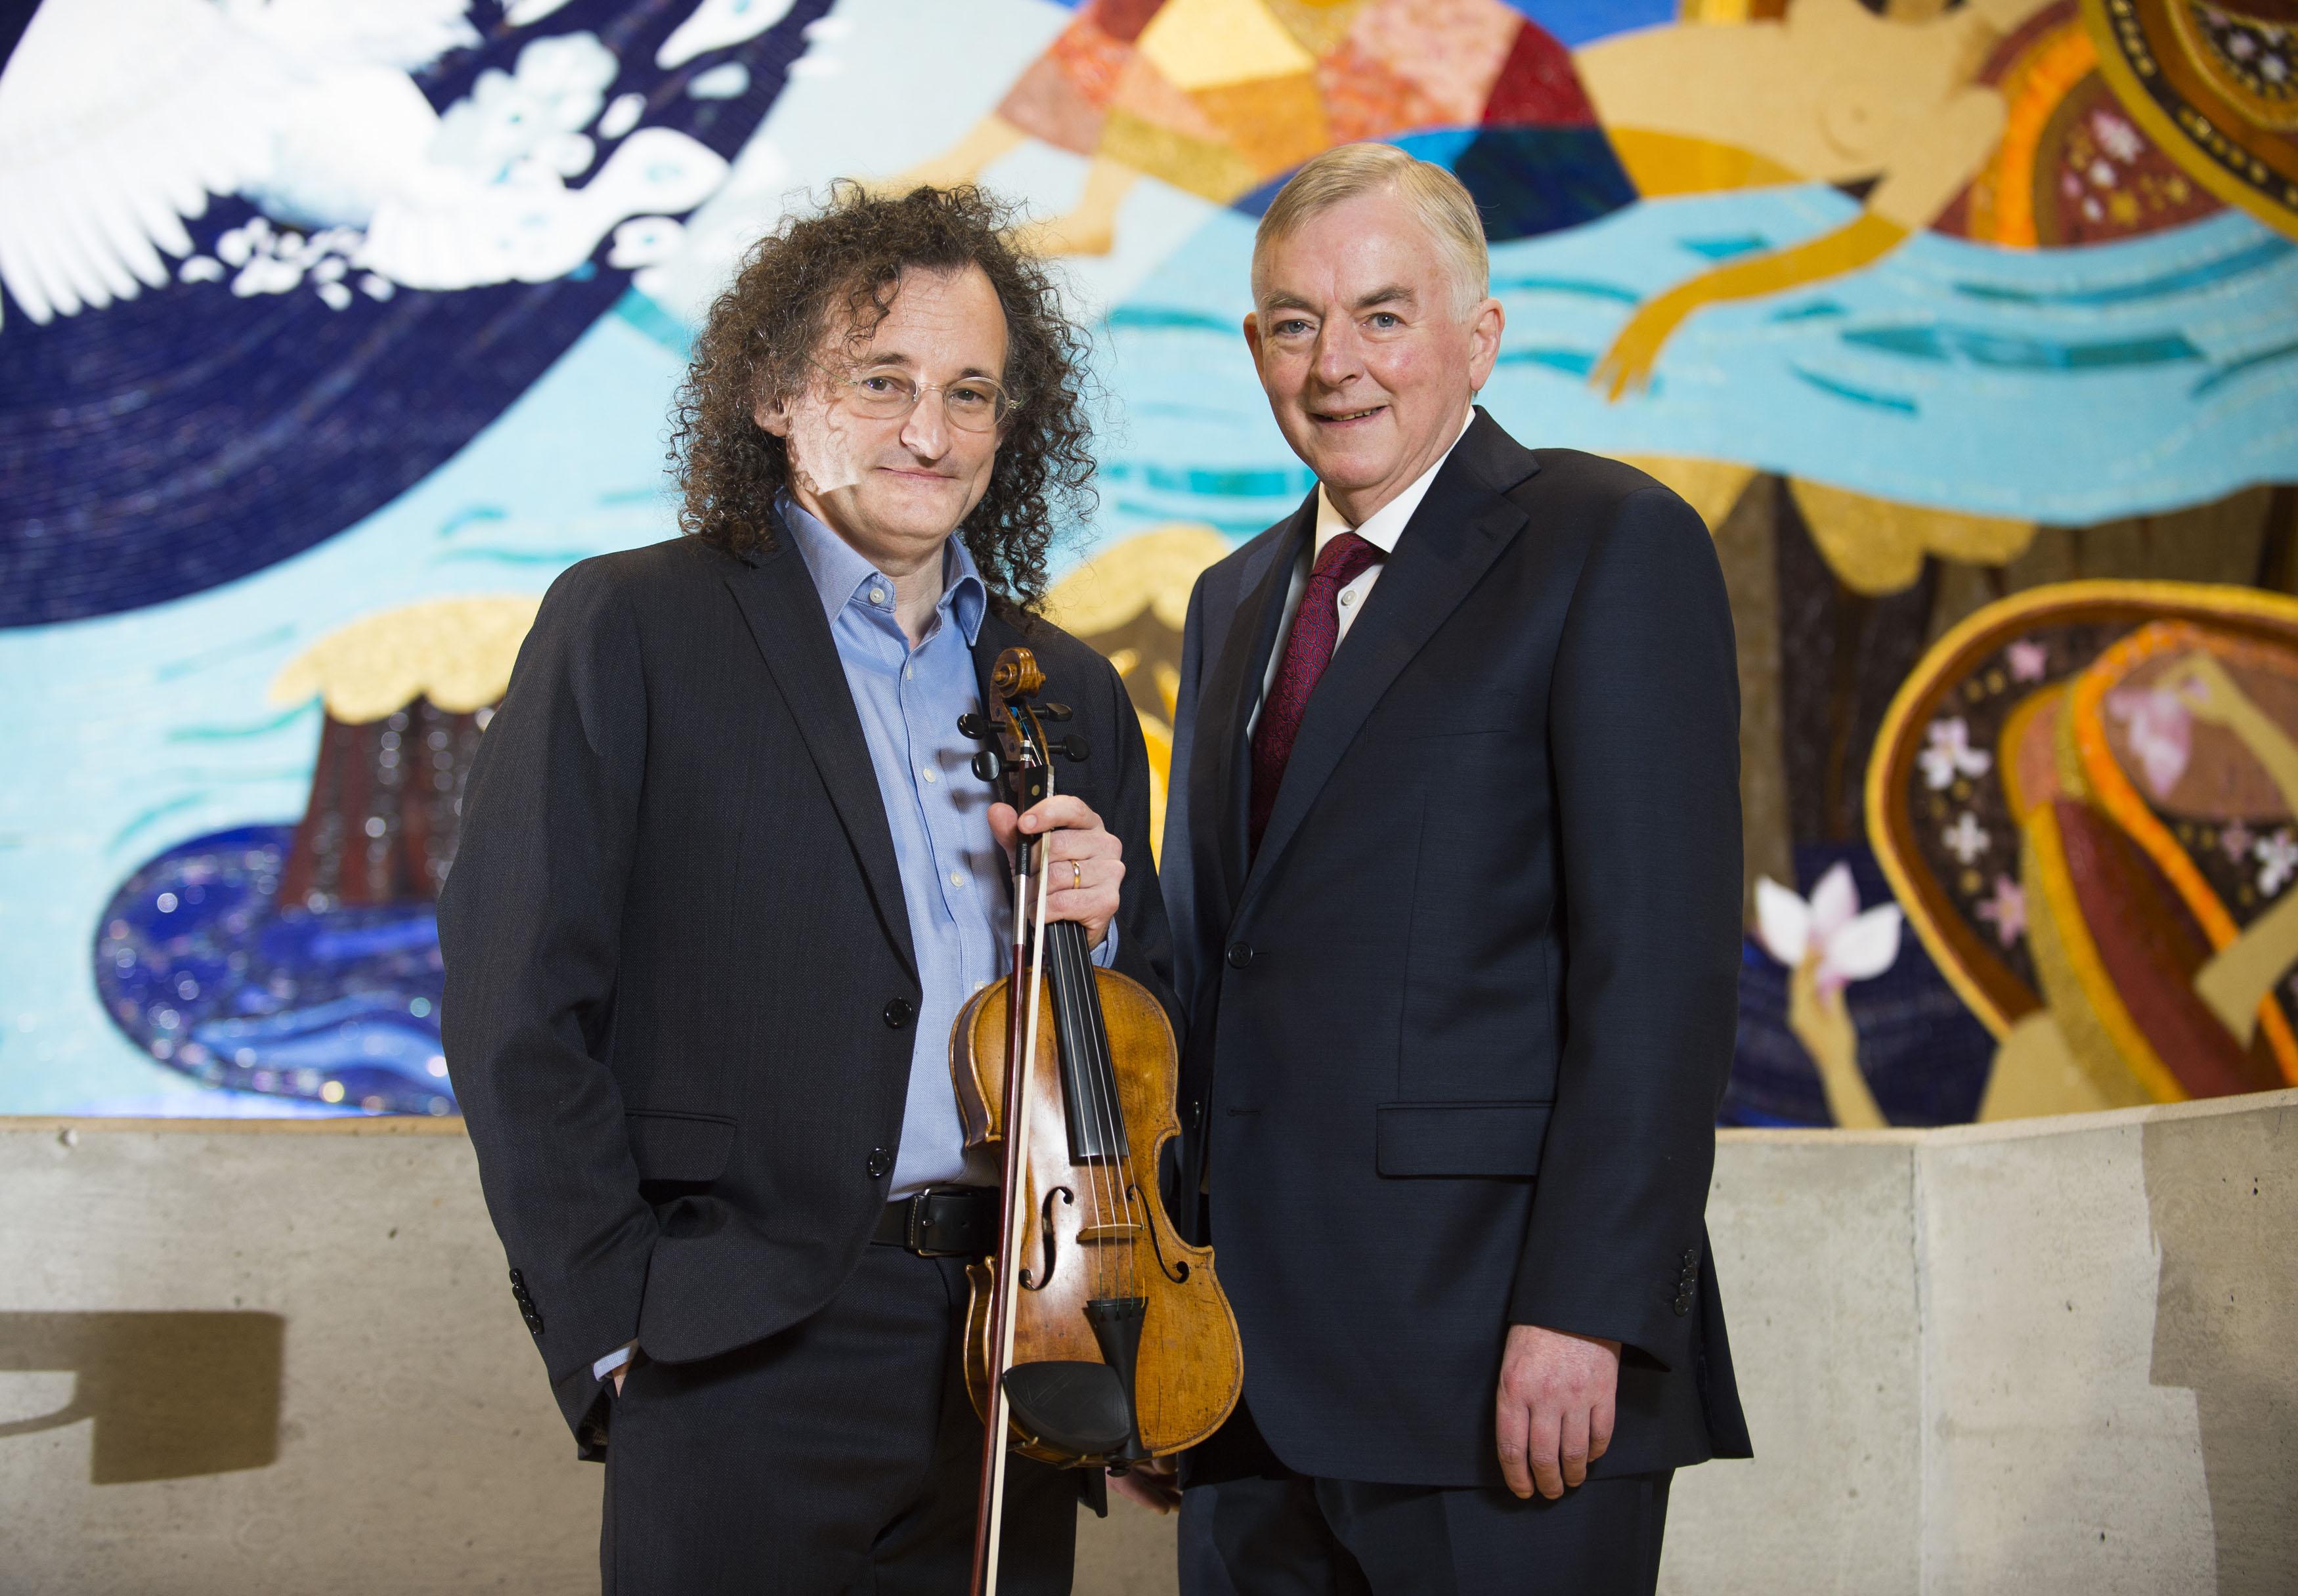 Martin Hayes named Irish World Academy Artist